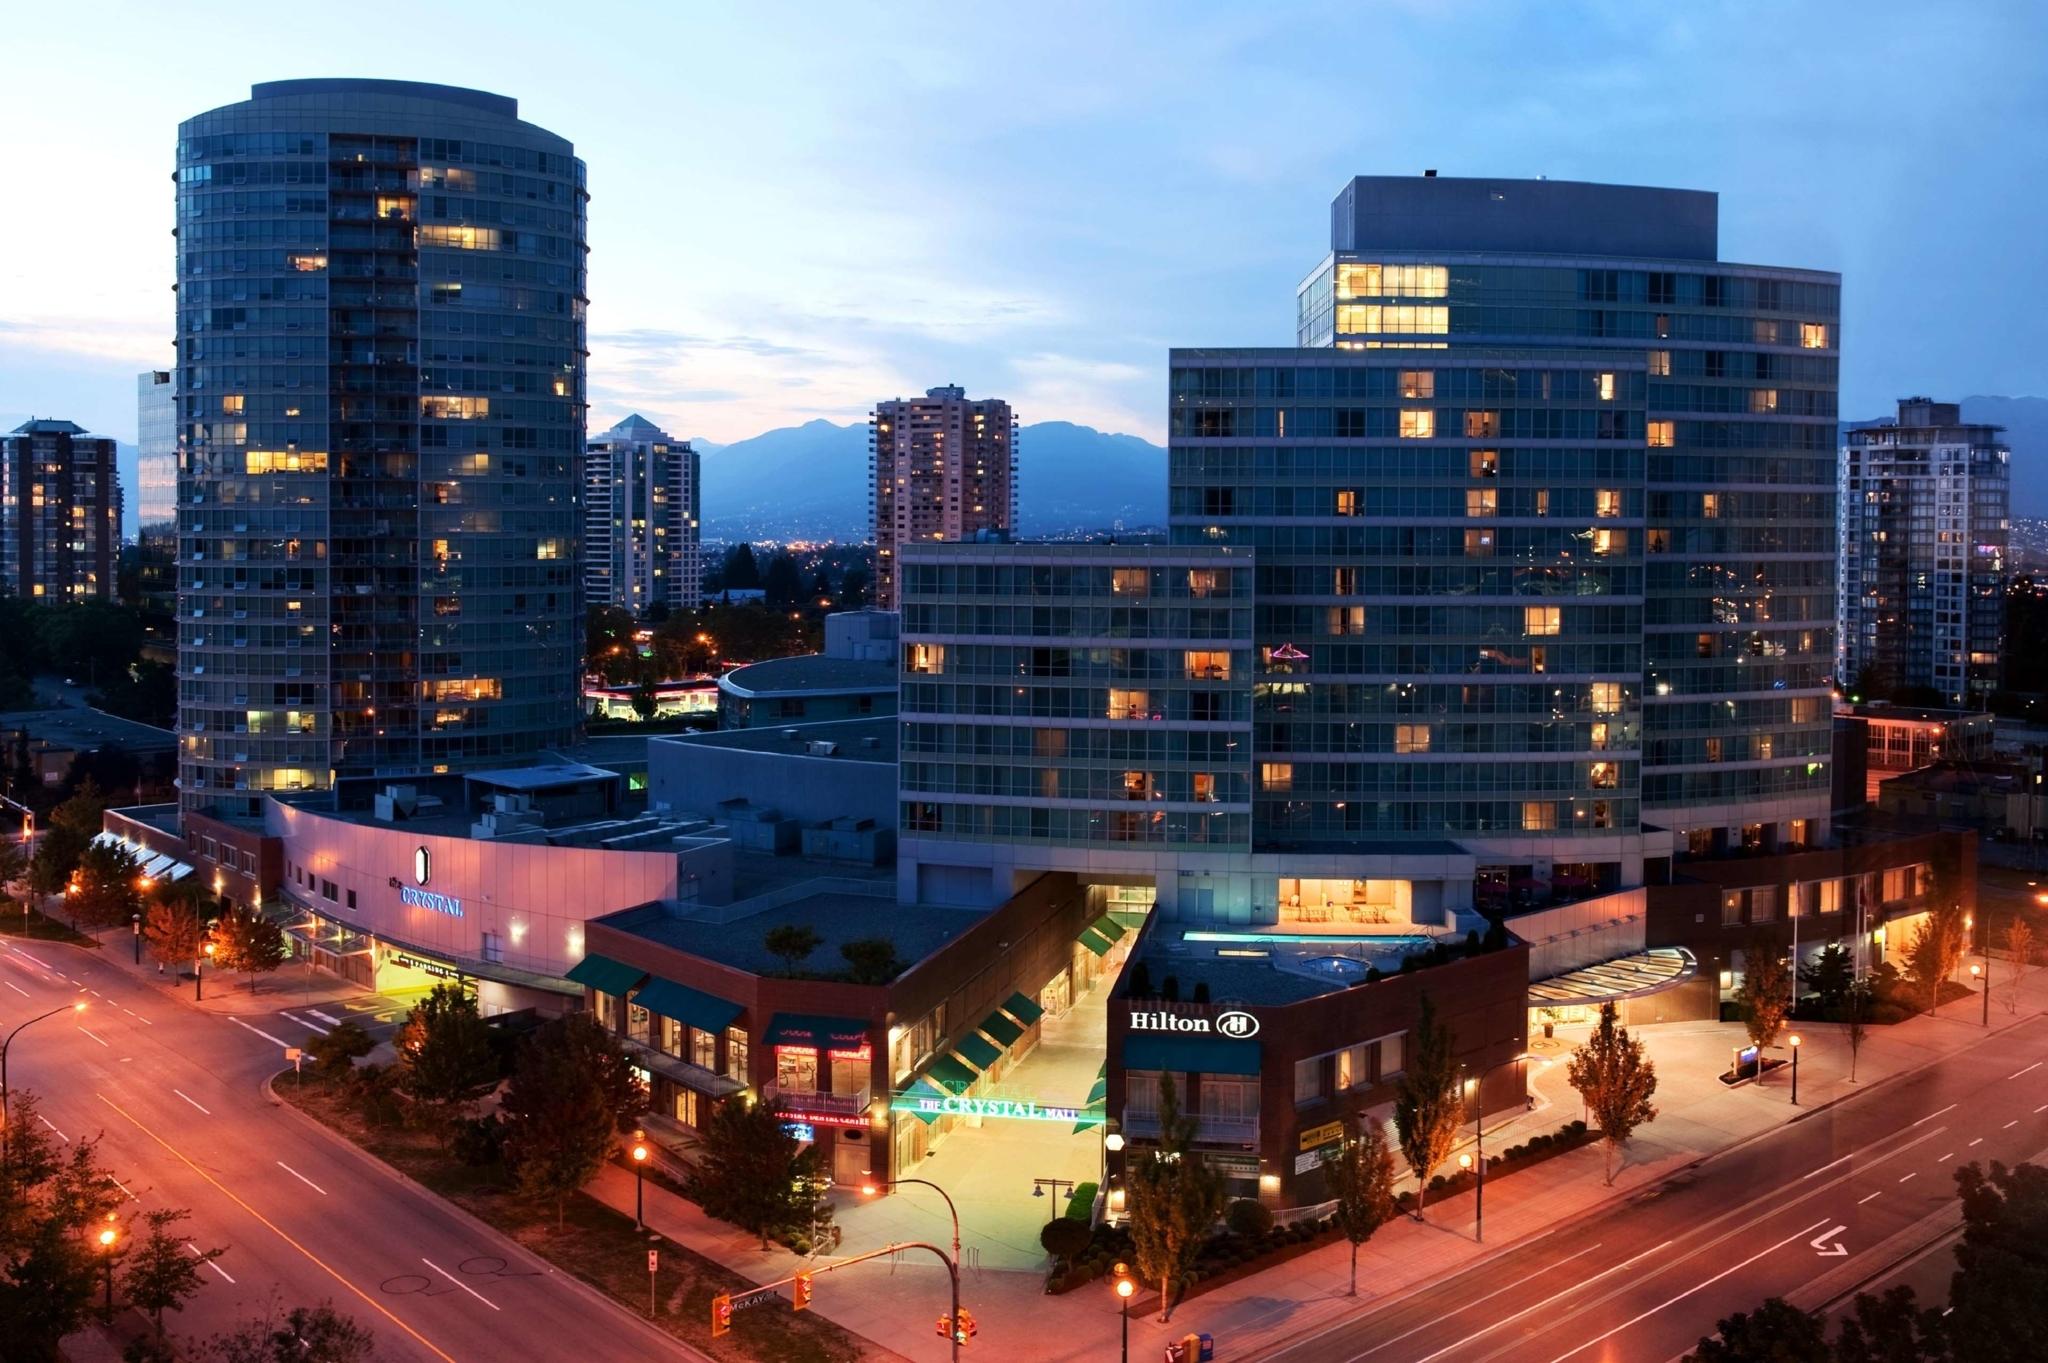 Hilton Vancouver Metrotown - Hotels